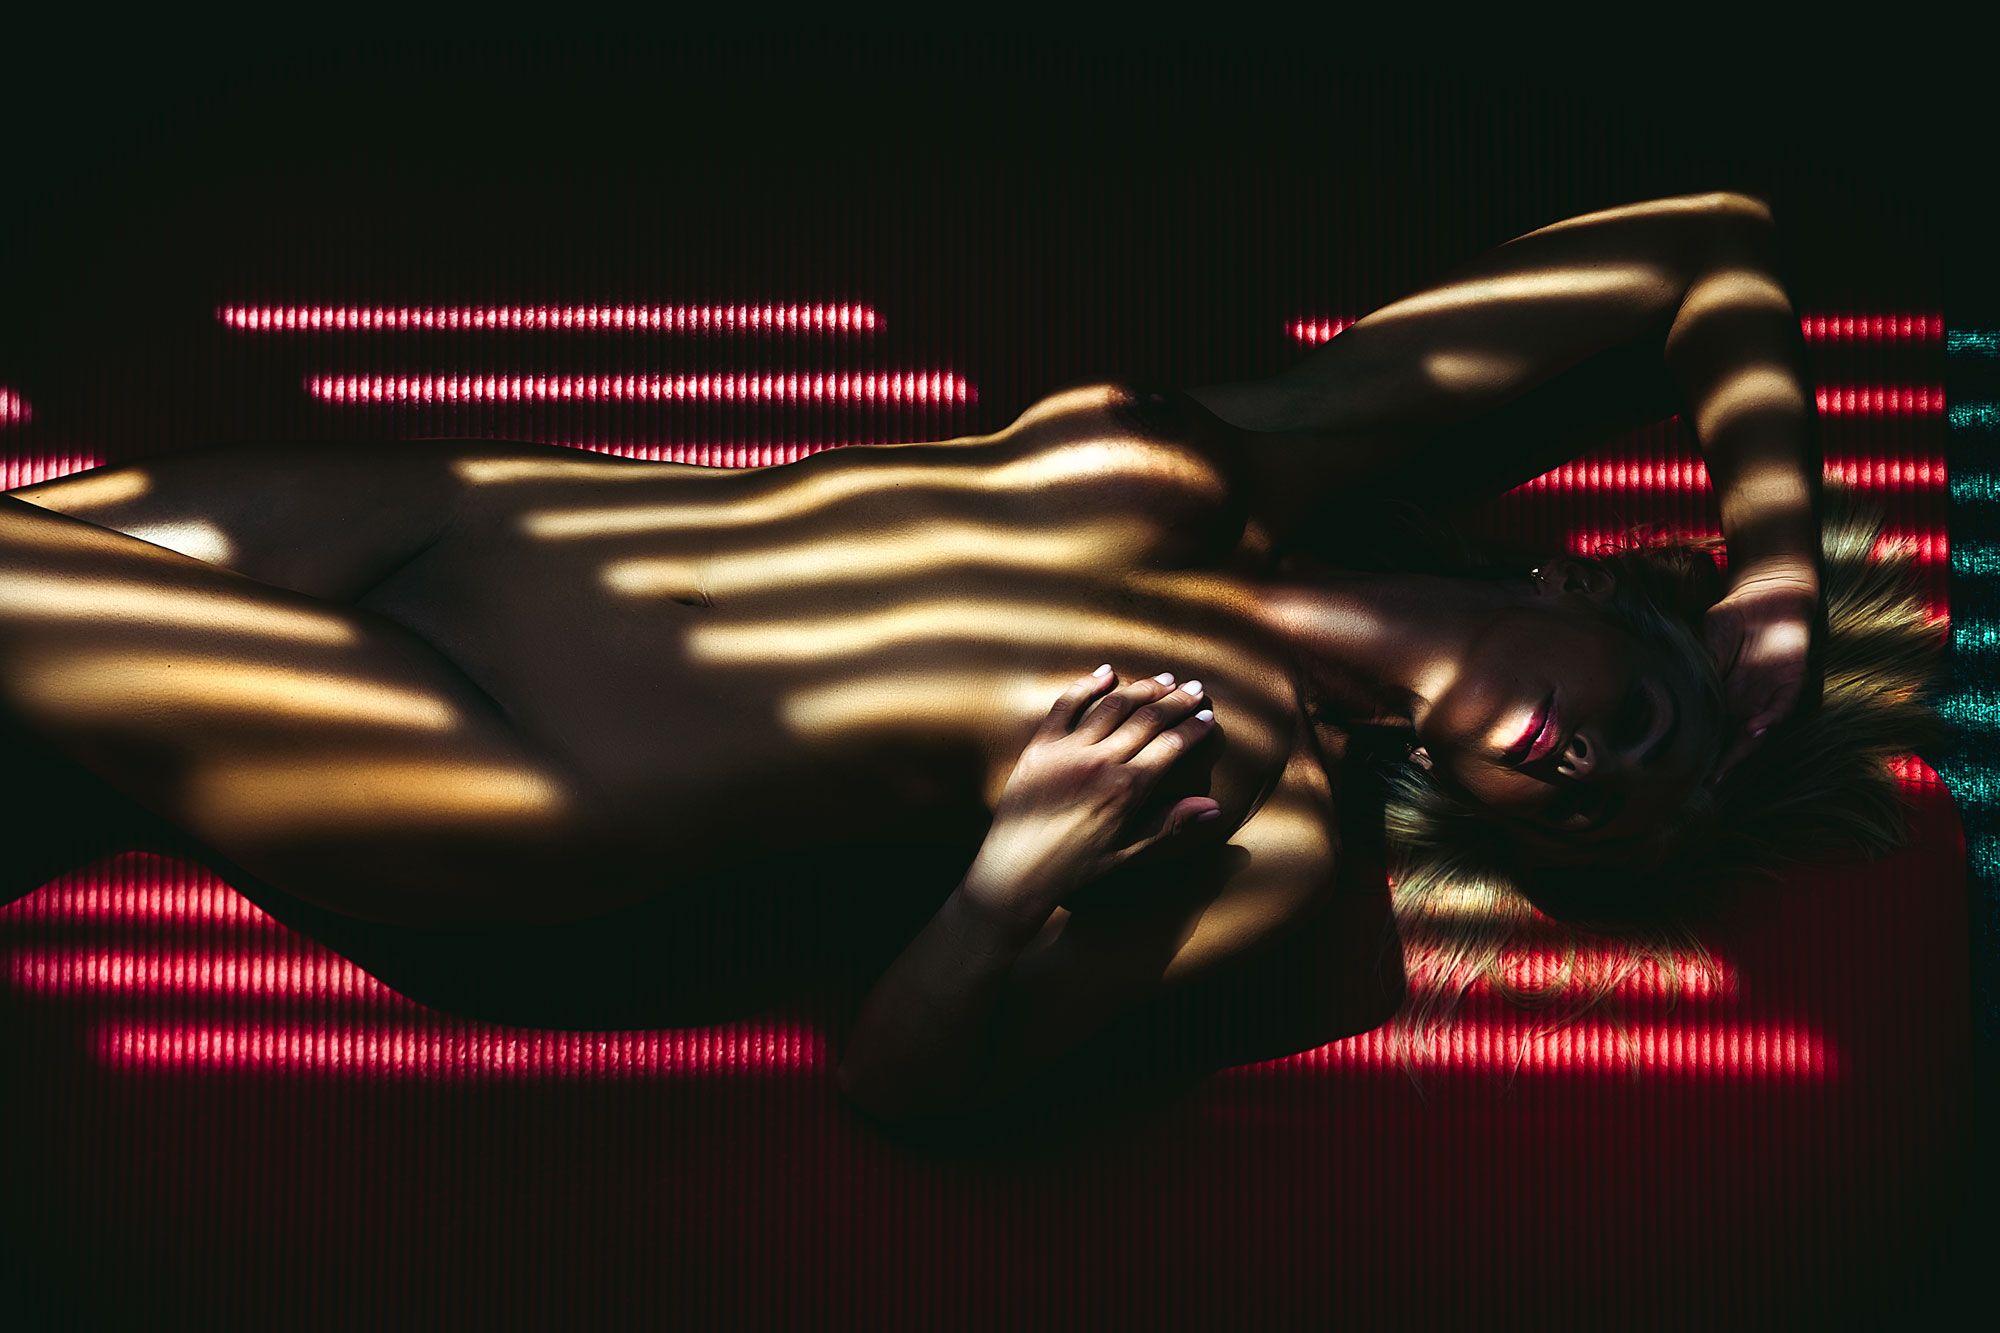 woman, portrait, nude, indoors, natural light, Руслан Болгов (Axe)